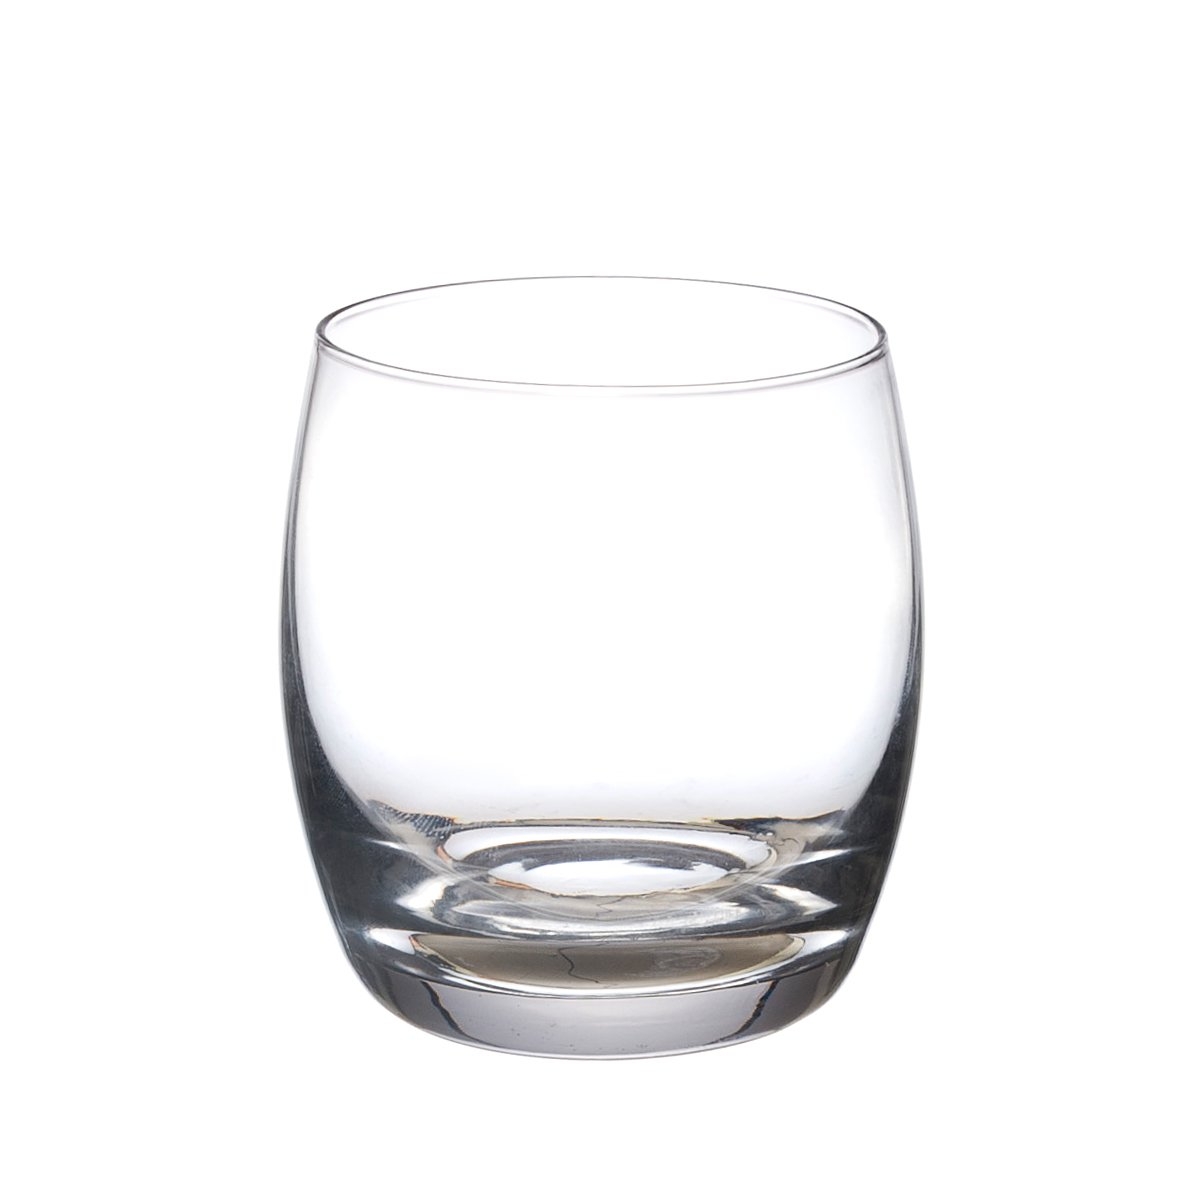 circle 透明玻璃杯 低口杯 水杯 杯子410ml